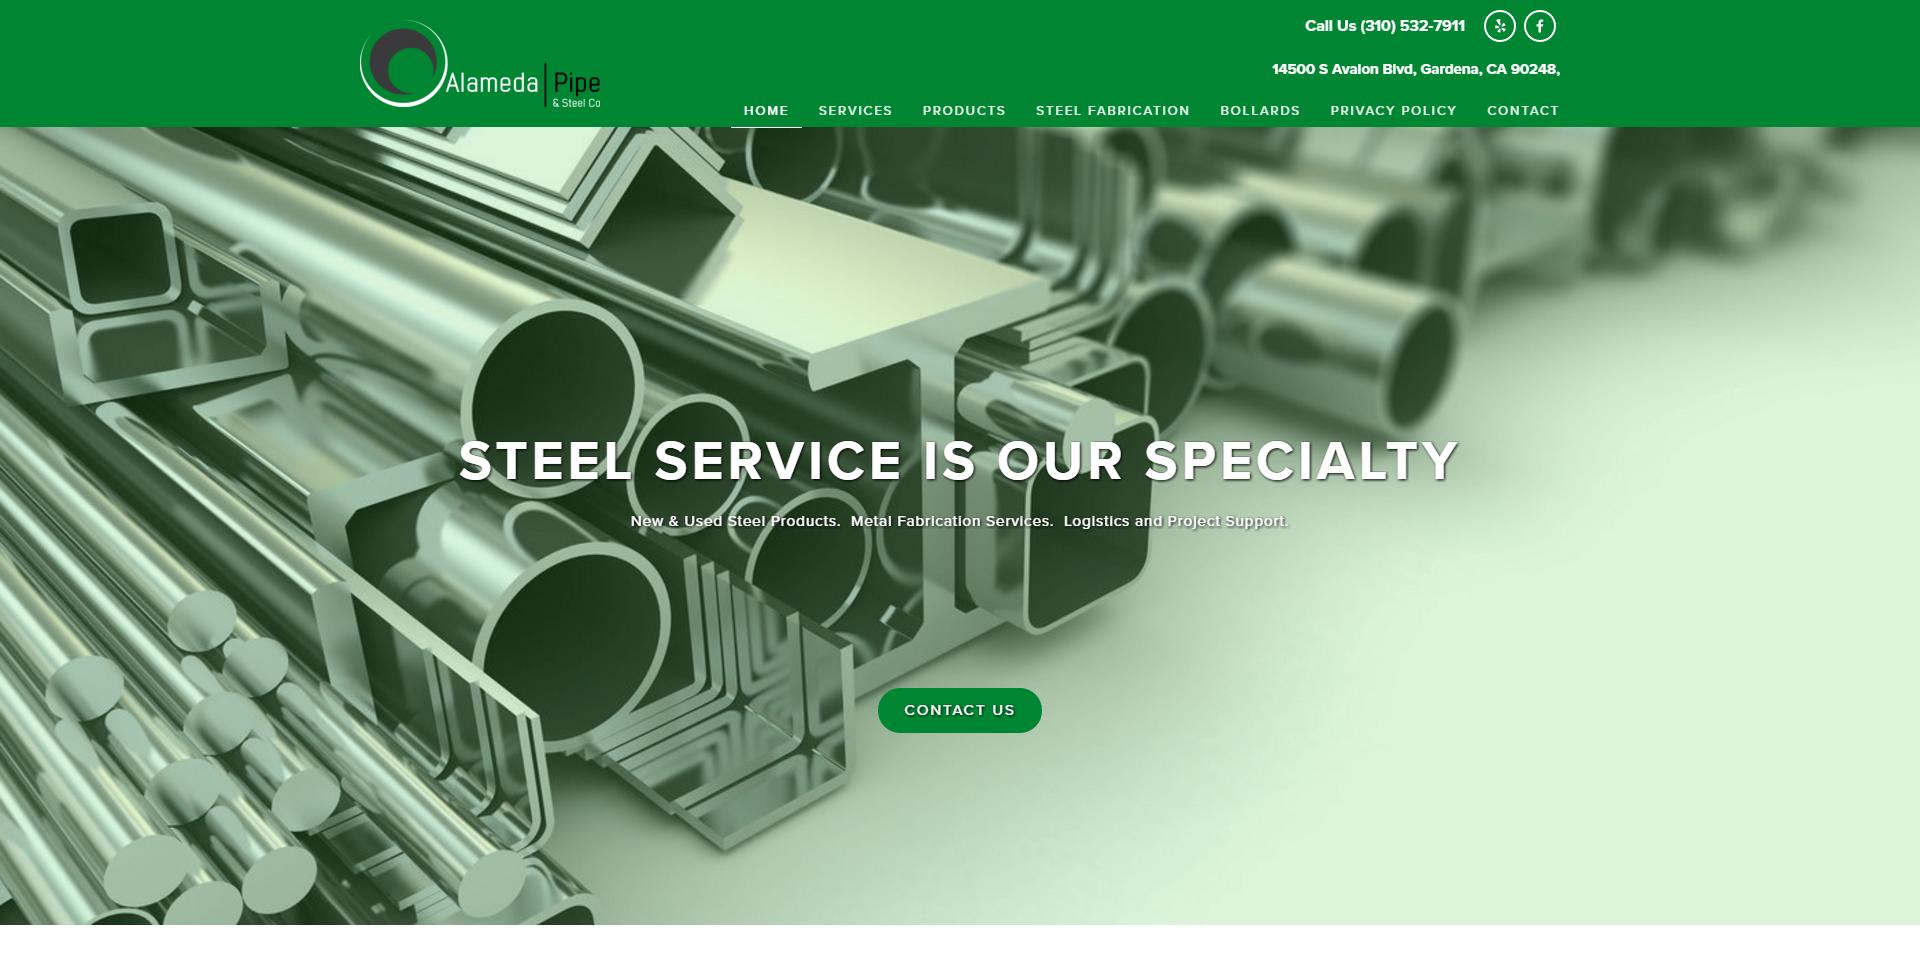 Alameda Pipe & Steel Company